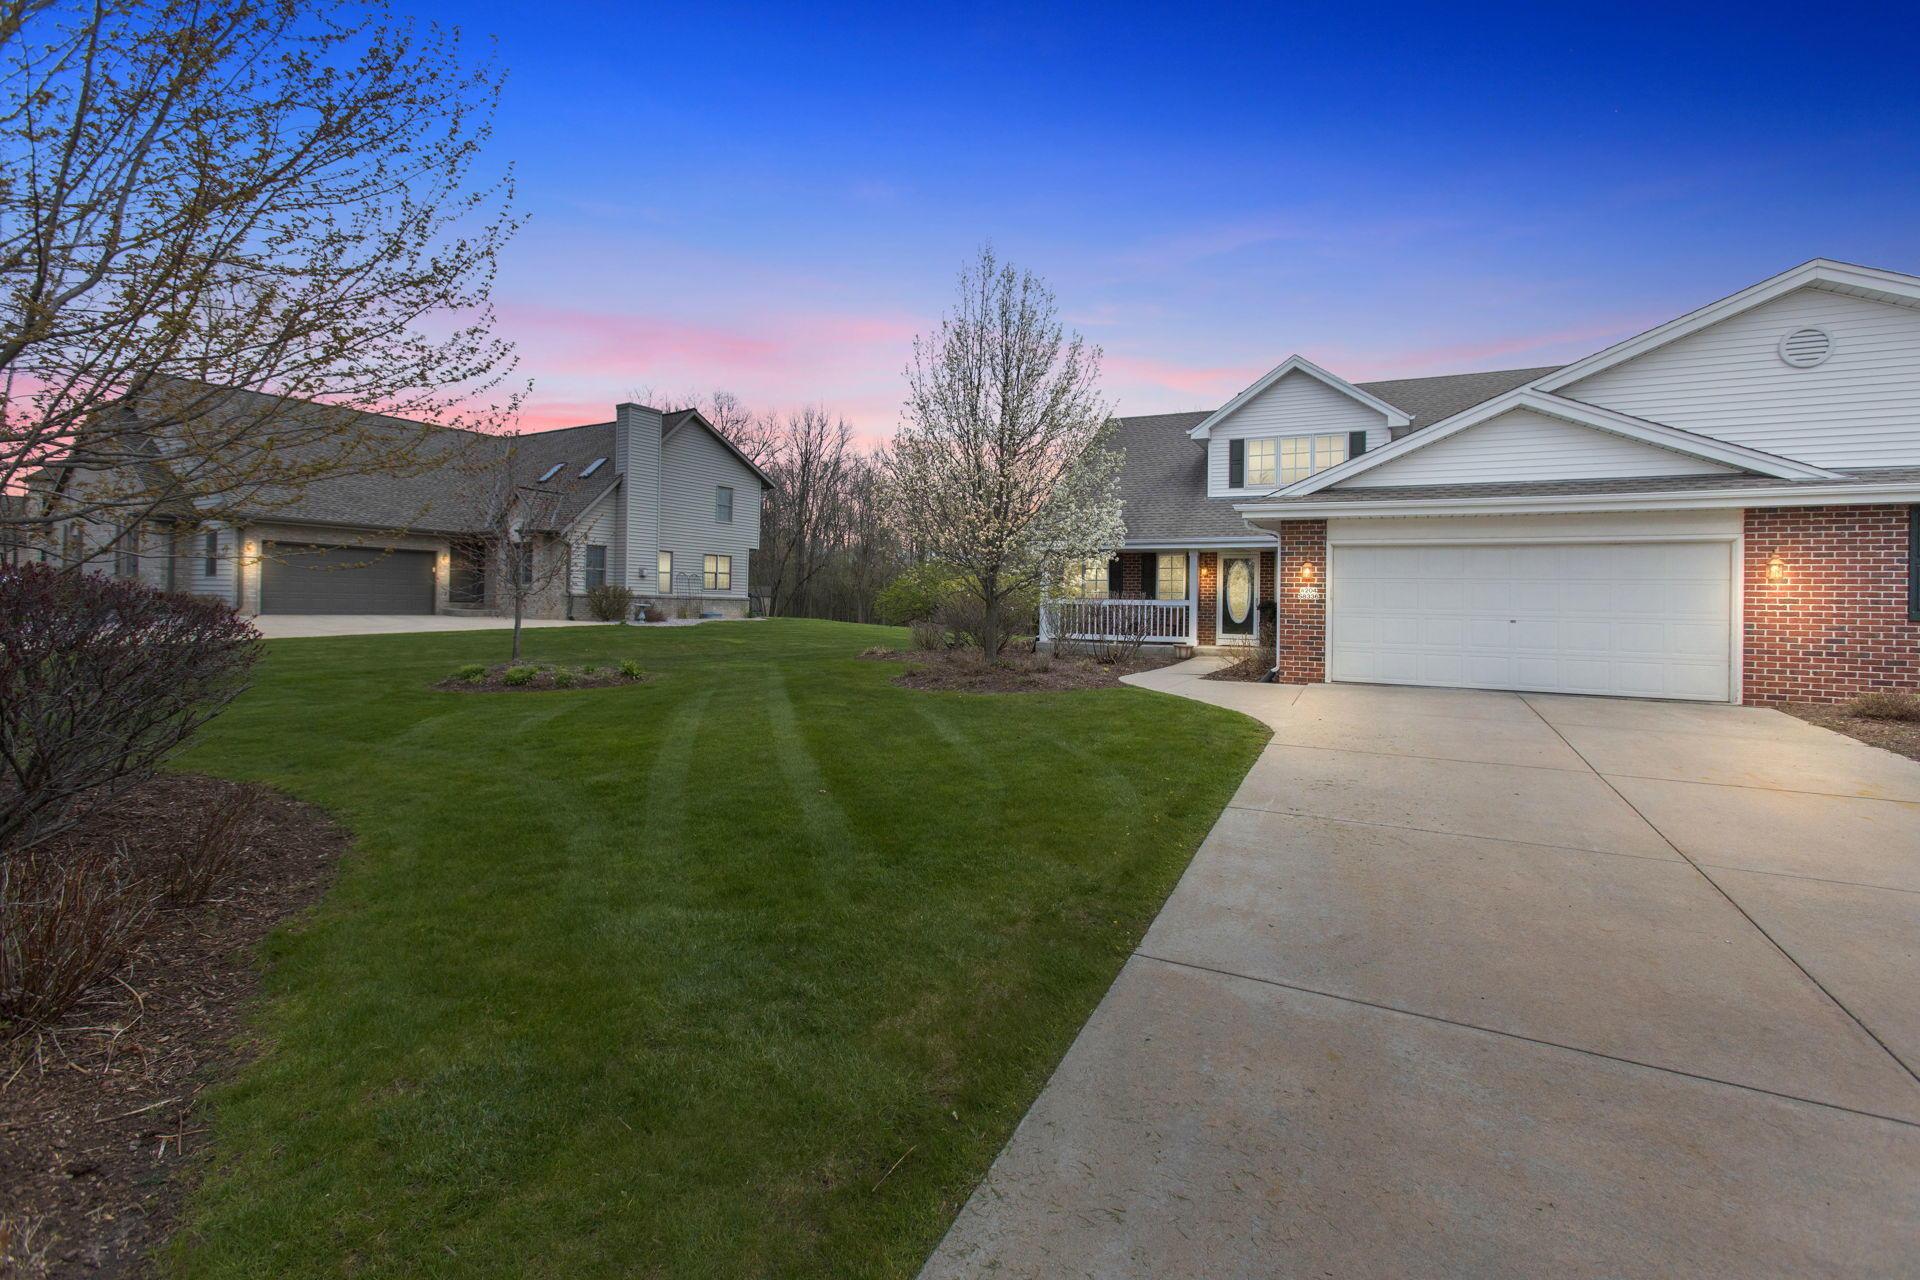 W204S8336 Pasadena Dr, Muskego, Wisconsin 53150, 3 Bedrooms Bedrooms, 7 Rooms Rooms,2 BathroomsBathrooms,Condominiums,For Sale,Pasadena Dr,1,1687400